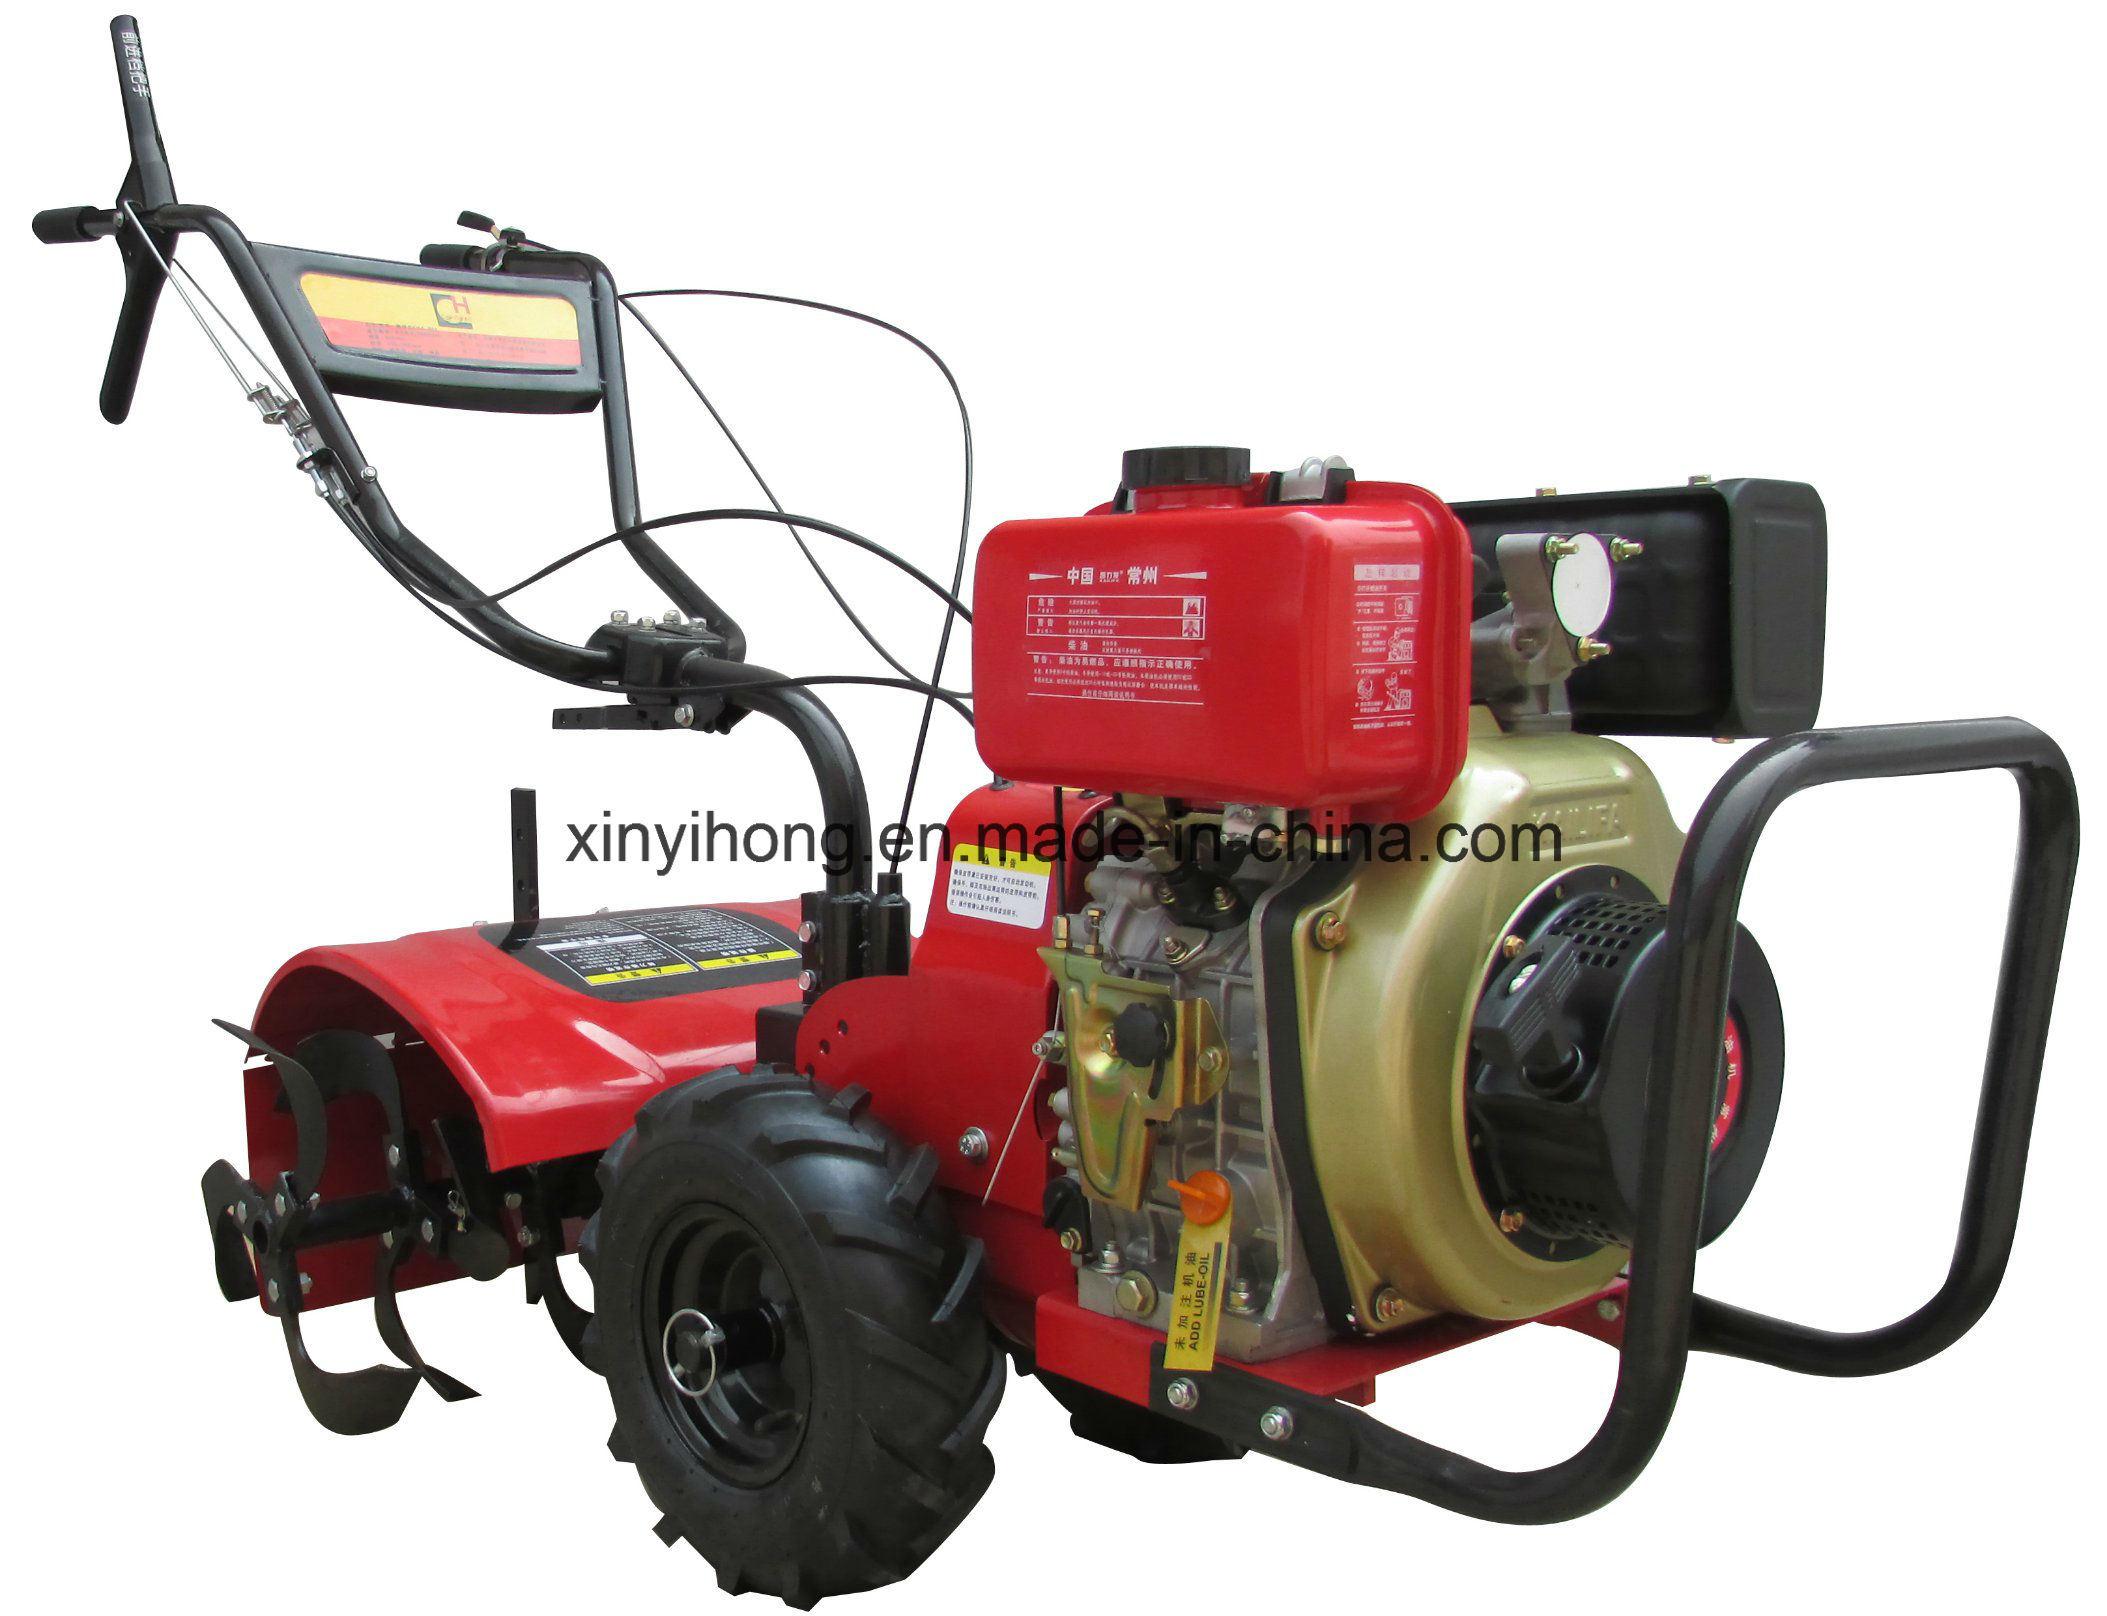 7HP Diesel Rotary Tiller with 178f Engine Power Tiller